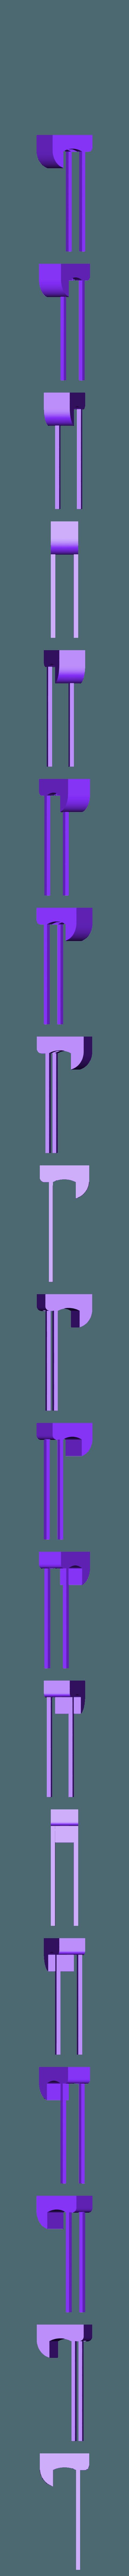 Phone Camera Holder Top.stl Download free STL file Adjustable Tripod (FULLY 3D PRINTED) • 3D printing design, samsuchin